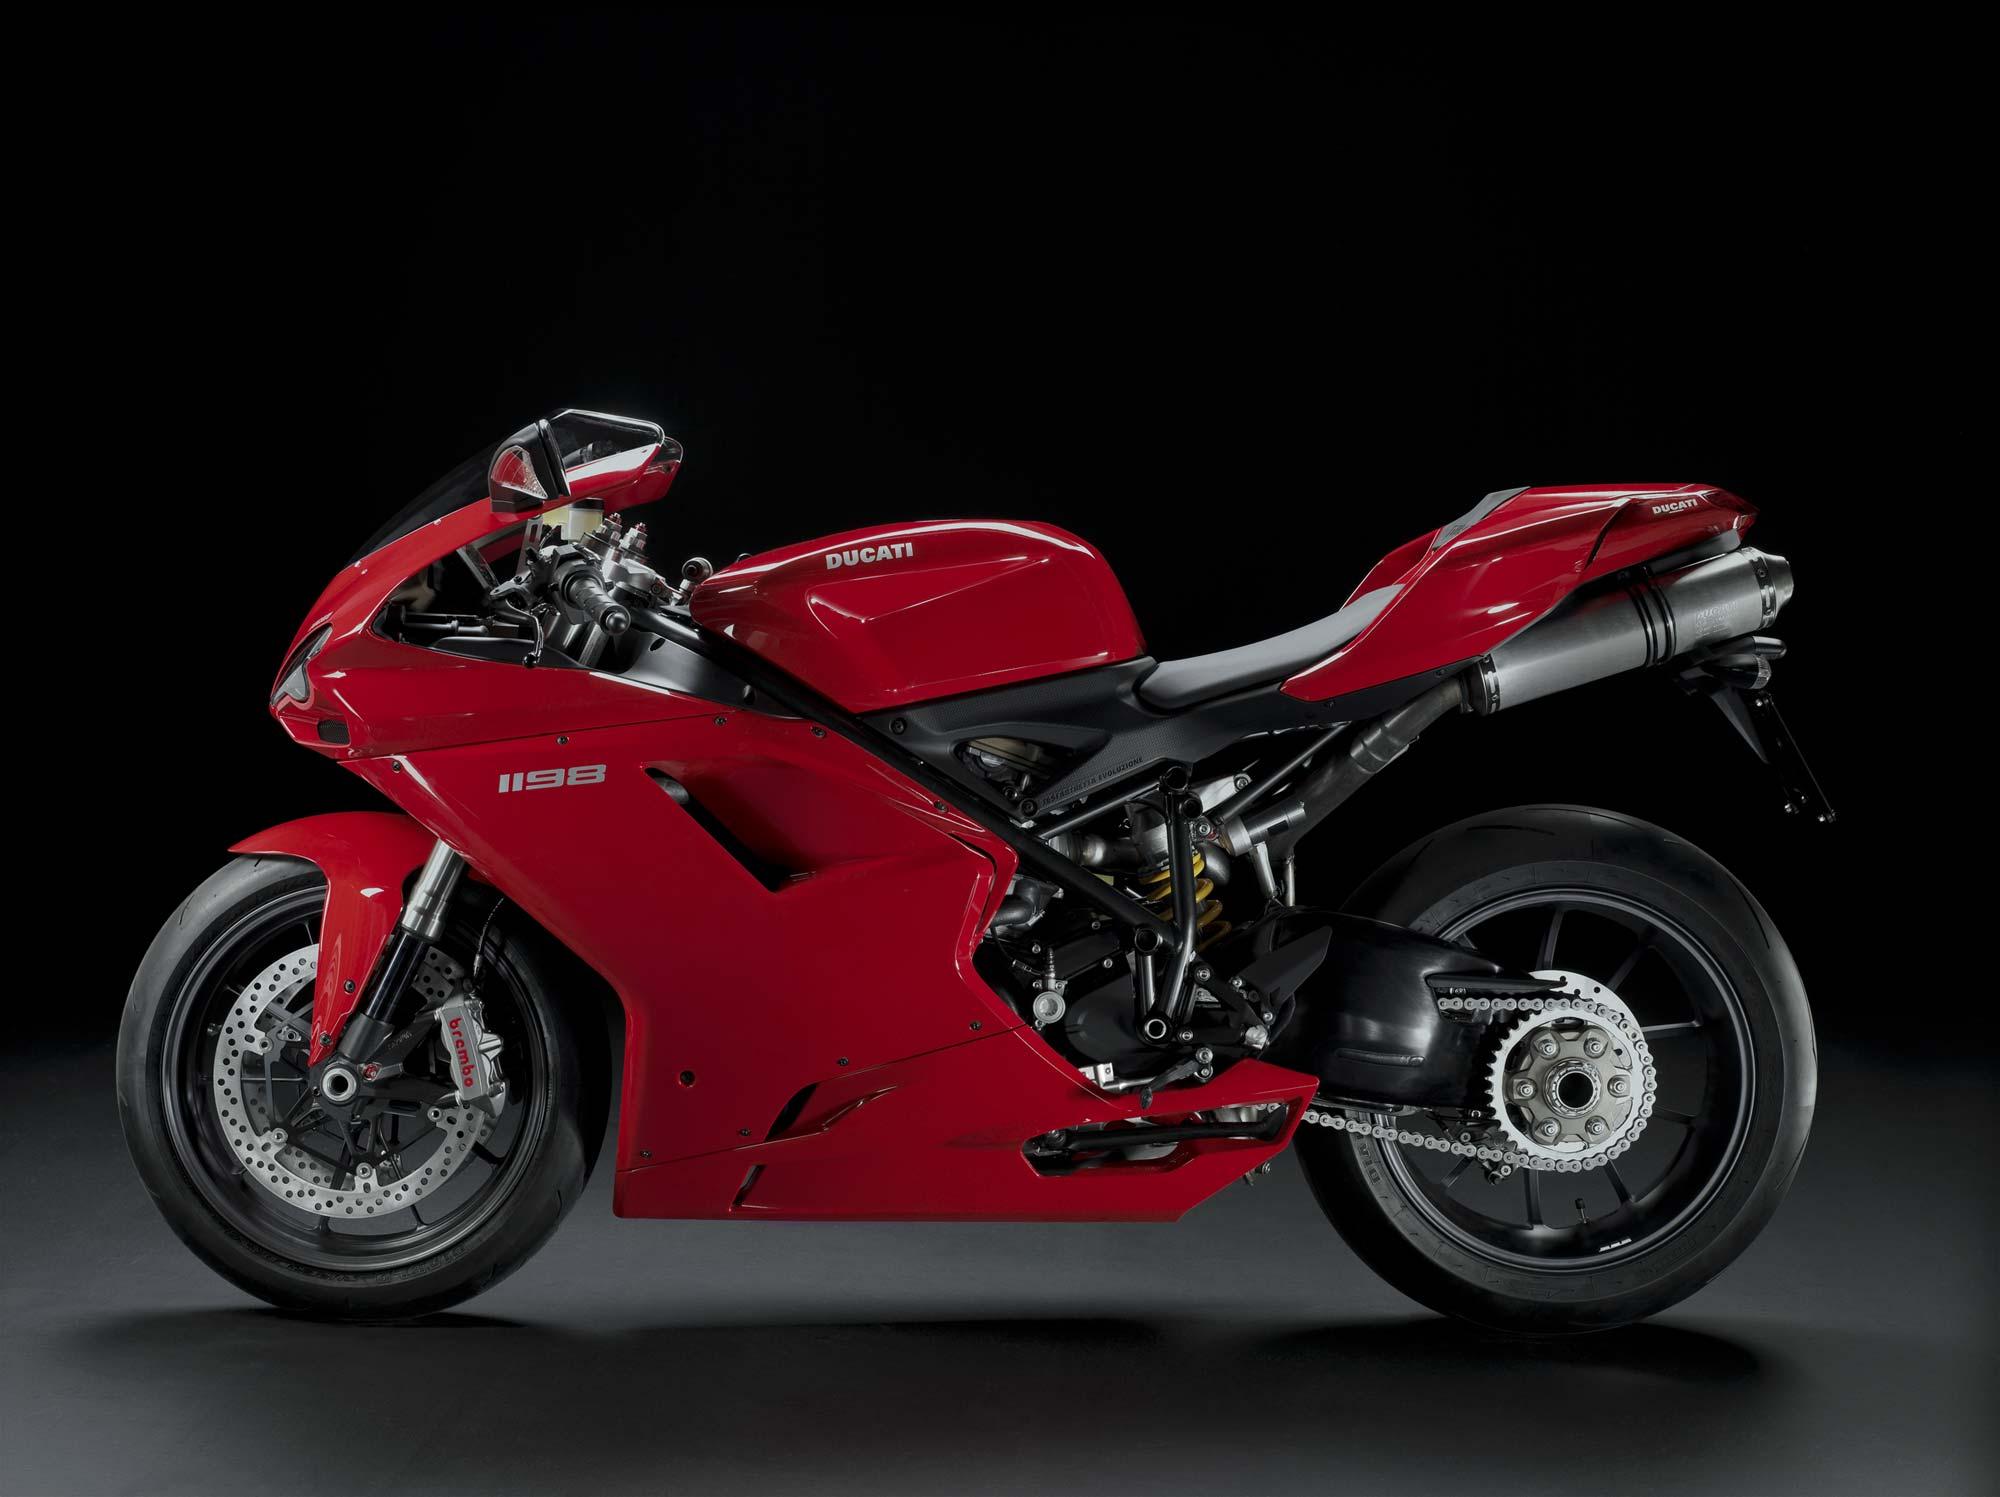 Super Bikes Motorbikes Bike: 2011 Ducati Superbike 1198 Gets Free Traction Control